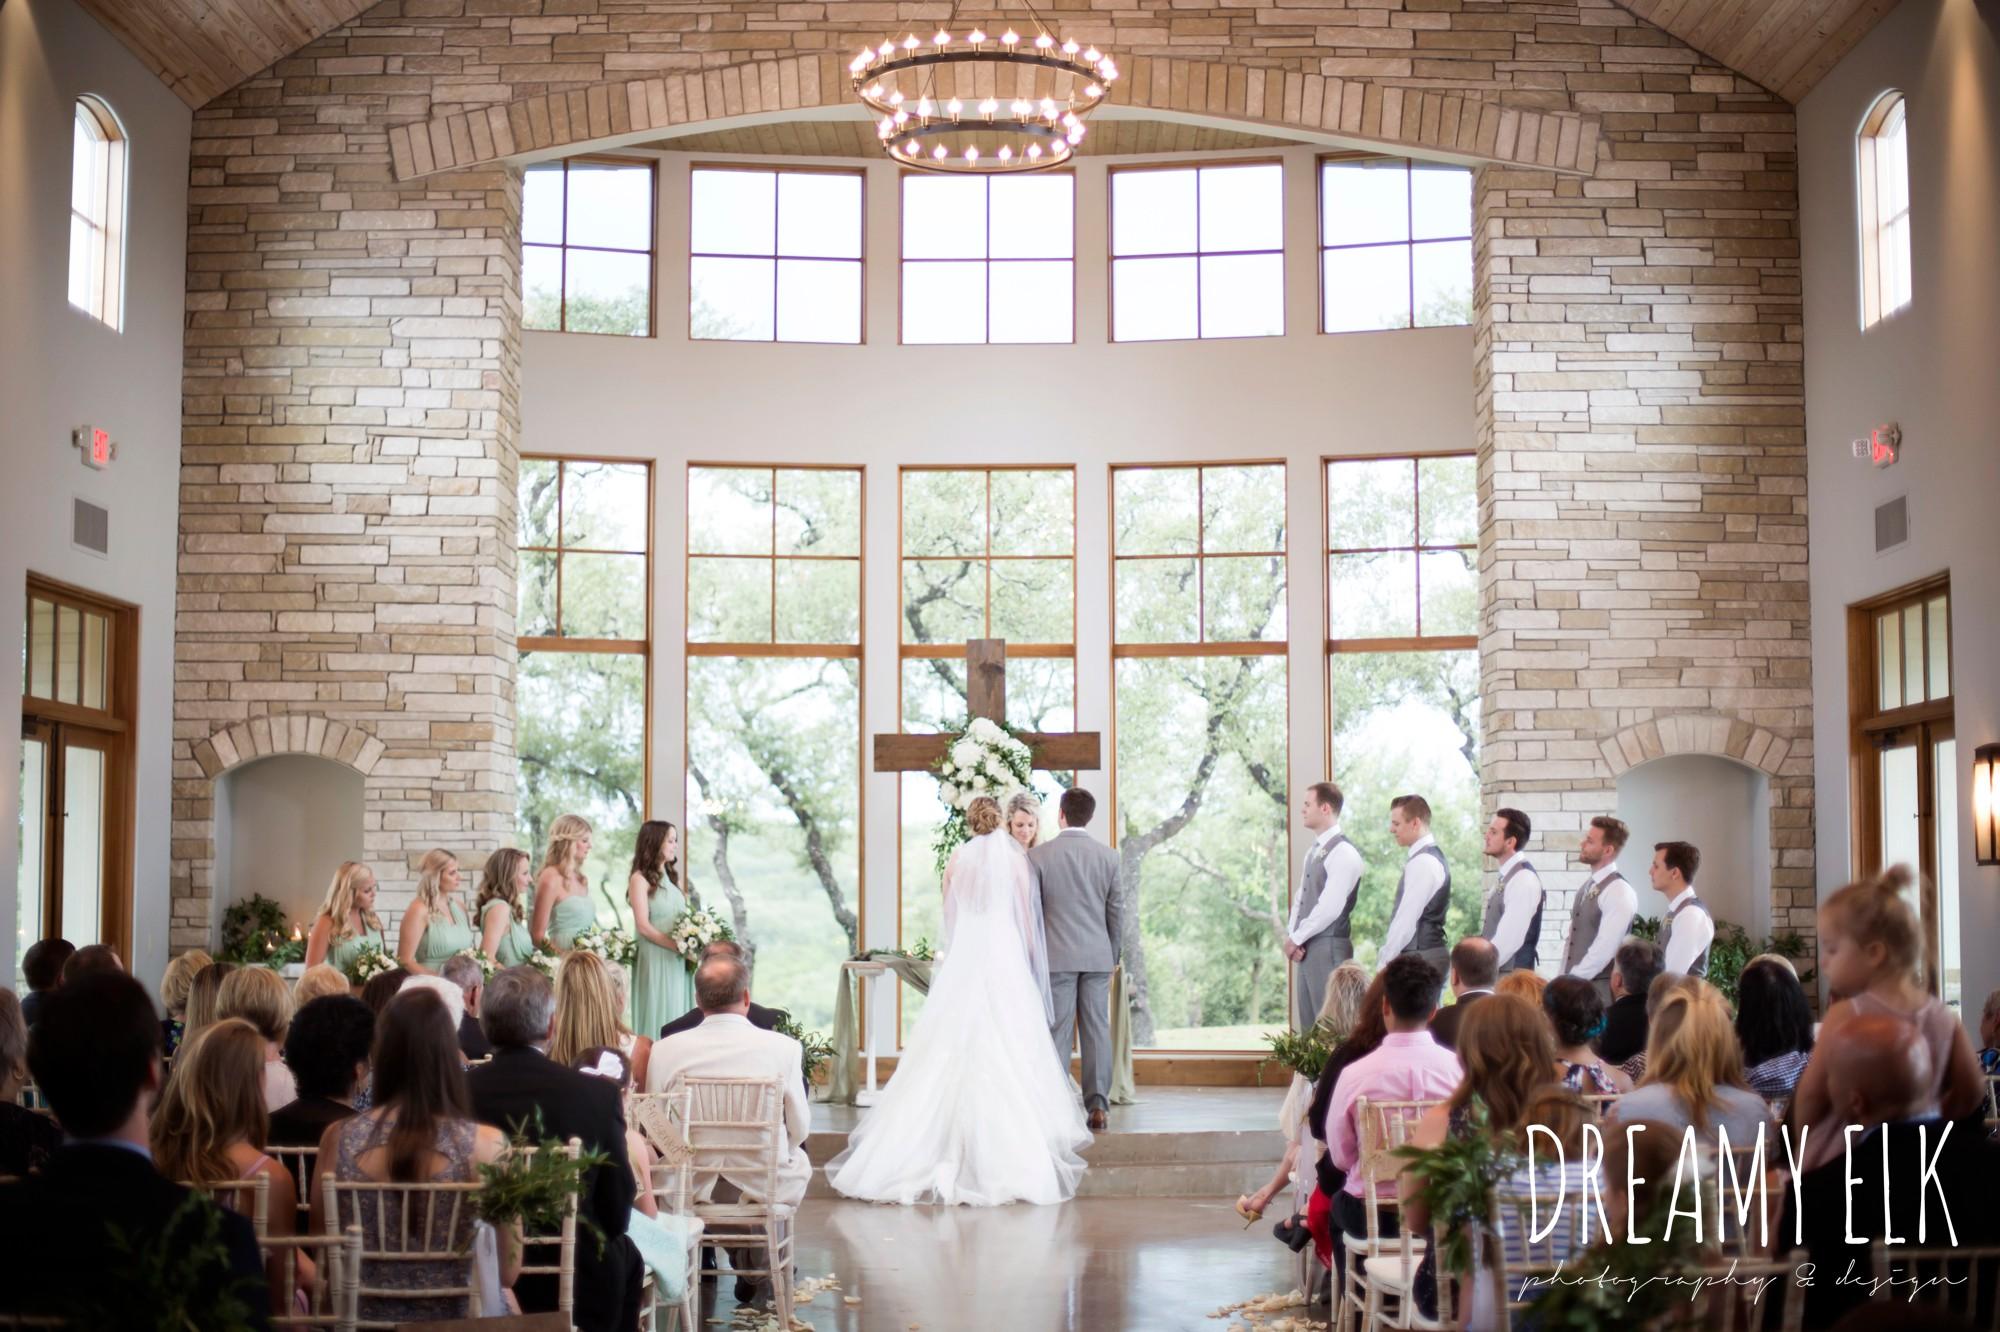 indoor wedding ceremony, summer july wedding photo, canyonwood ridge, dripping springs, texas {dreamy elk photography and design}